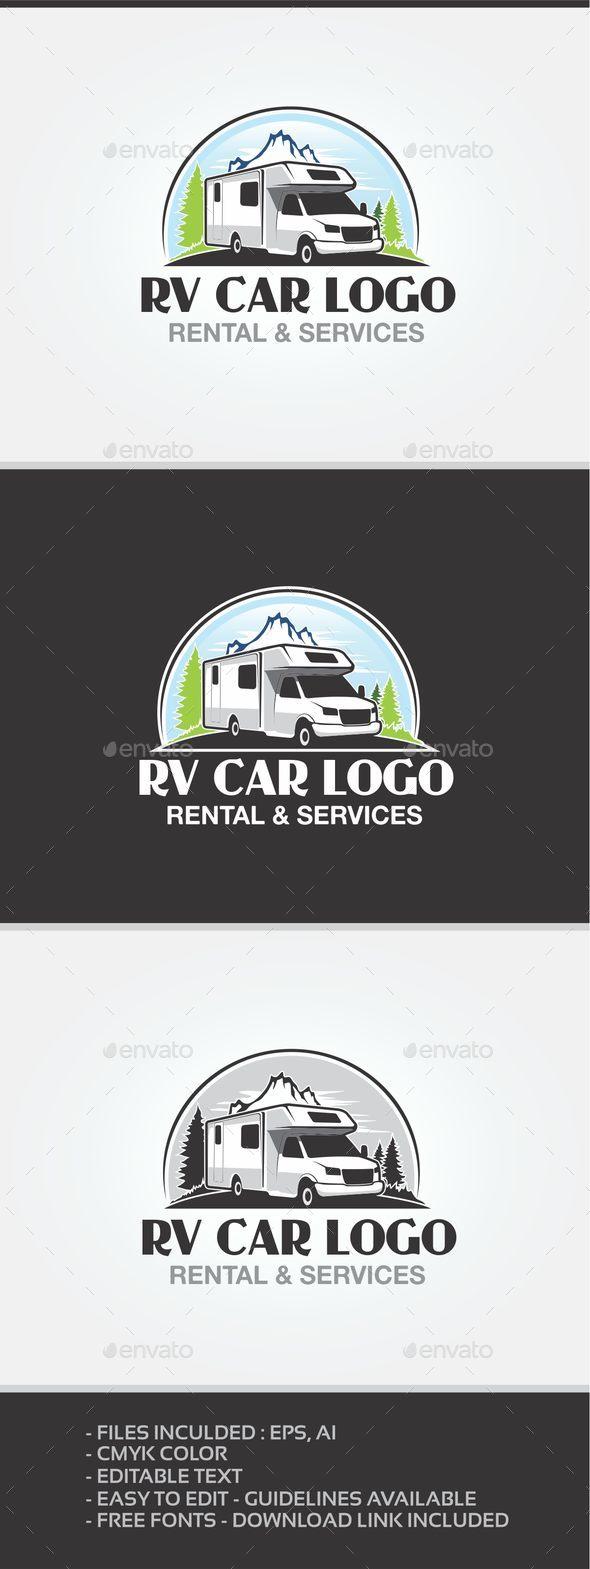 RV Car Logo